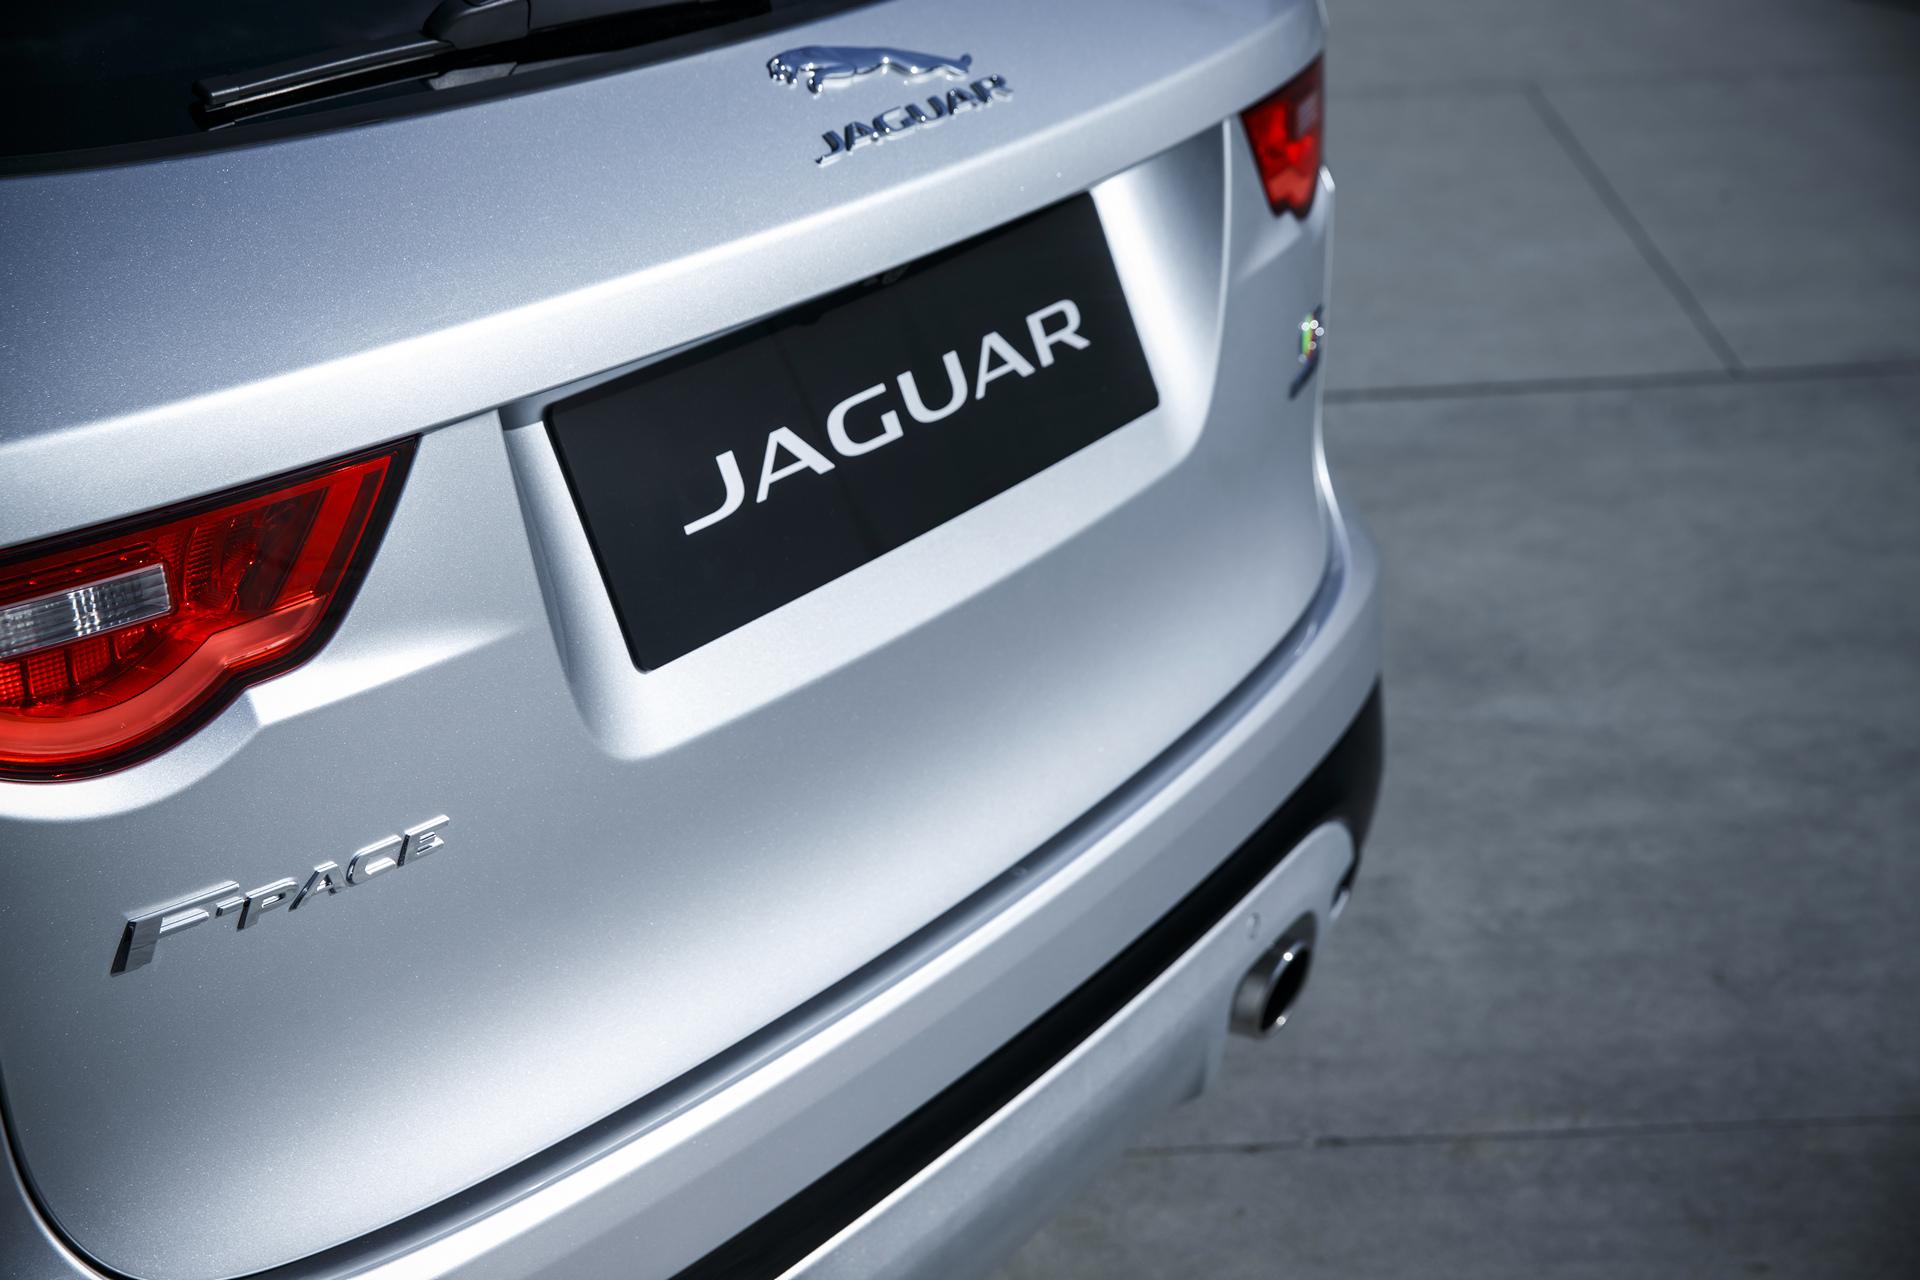 2017 Jaguar F-PACE © Tata Group